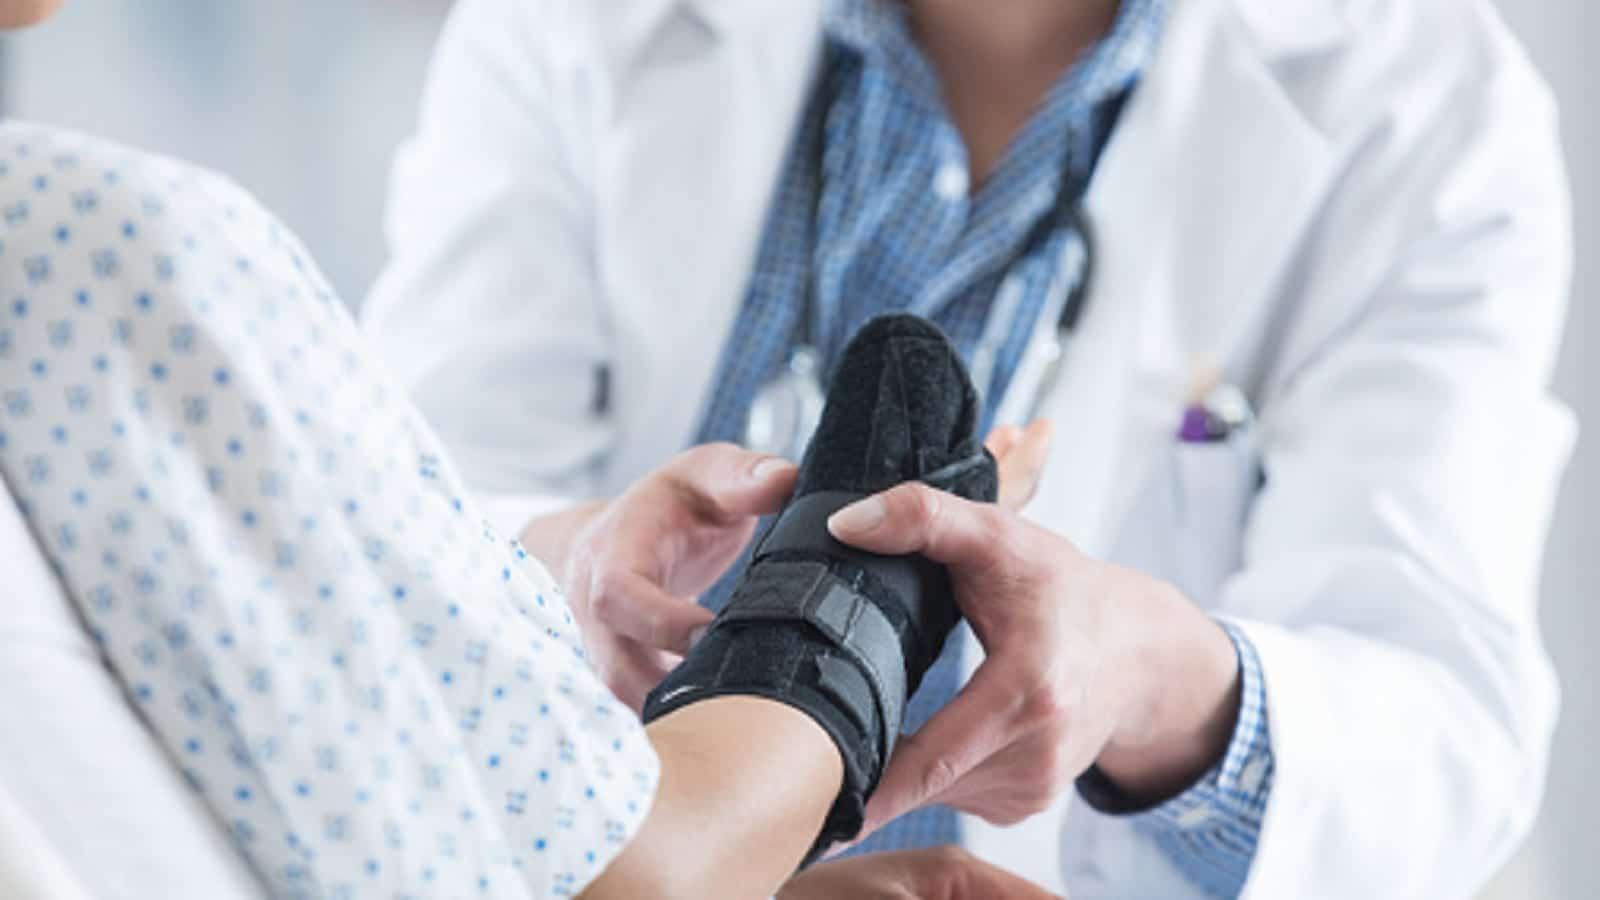 Woman With Wrist Injury Stock Photo